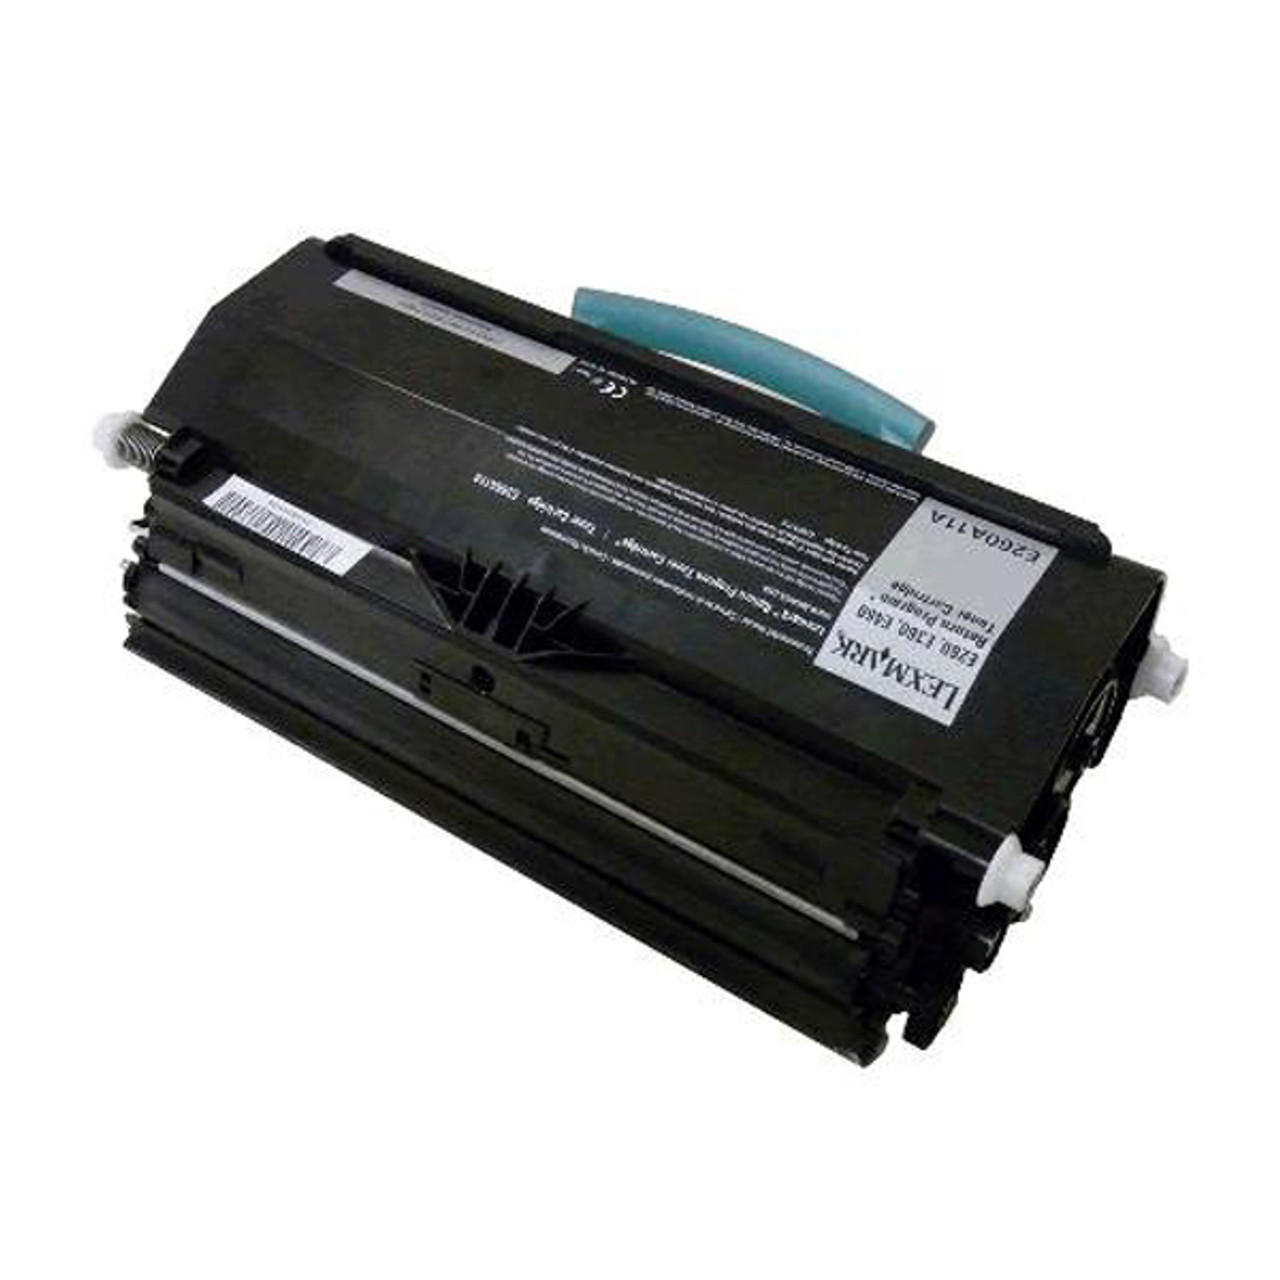 Lexmark x264 Toner Cartridge - Compatible